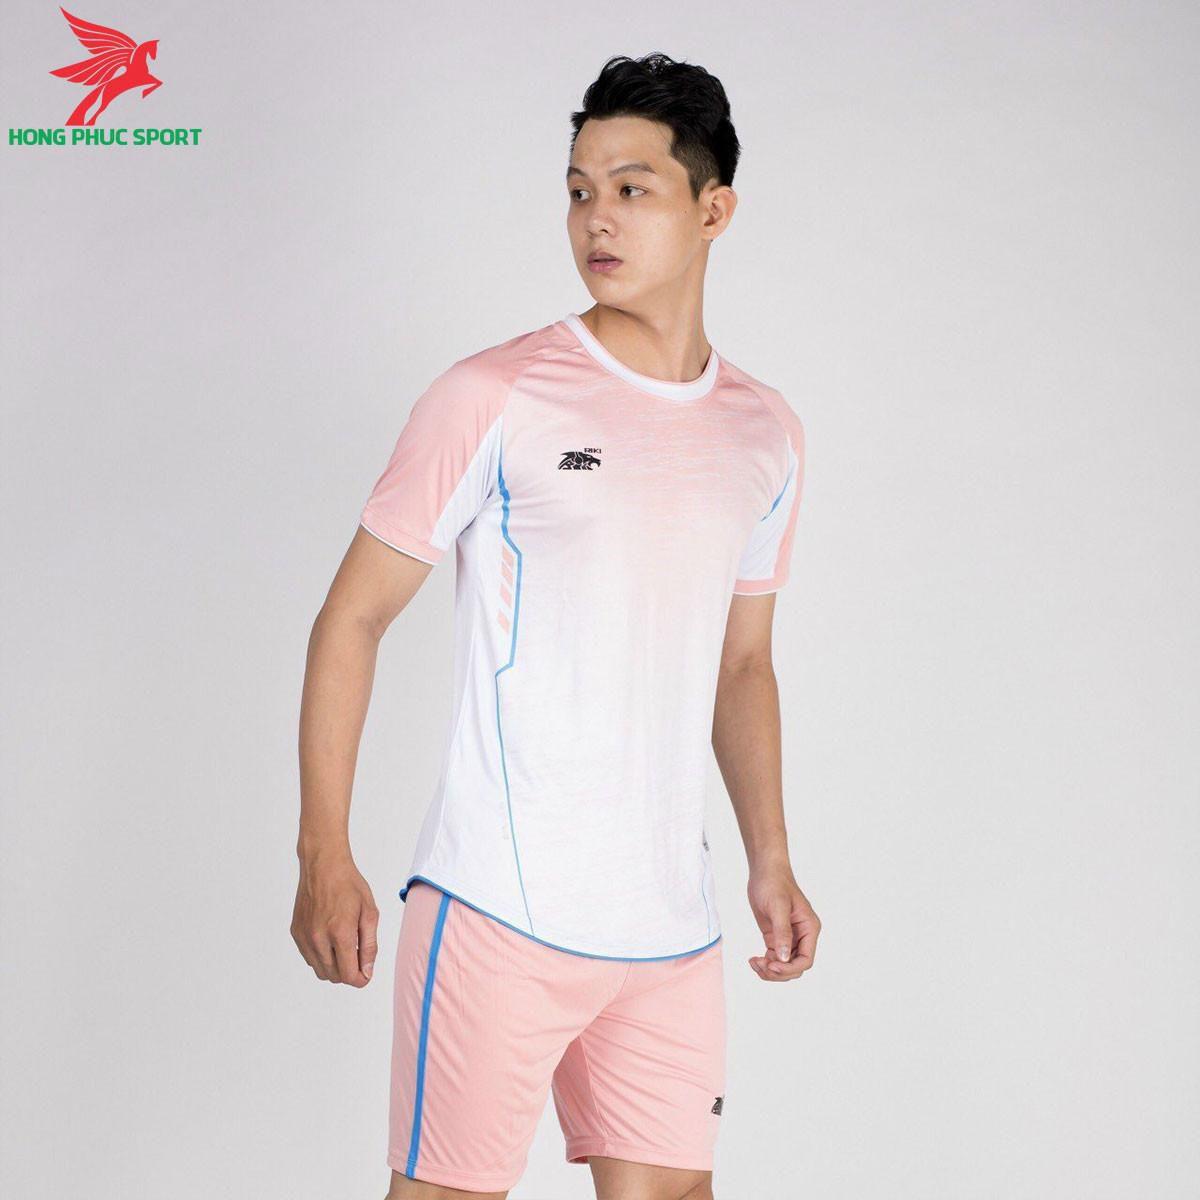 https://cdn.hongphucsport.com/unsafe/s4.shopbay.vn/files/285/ao-khong-logo-riki-grambor-hong-603e1bc7d23aa.jpg